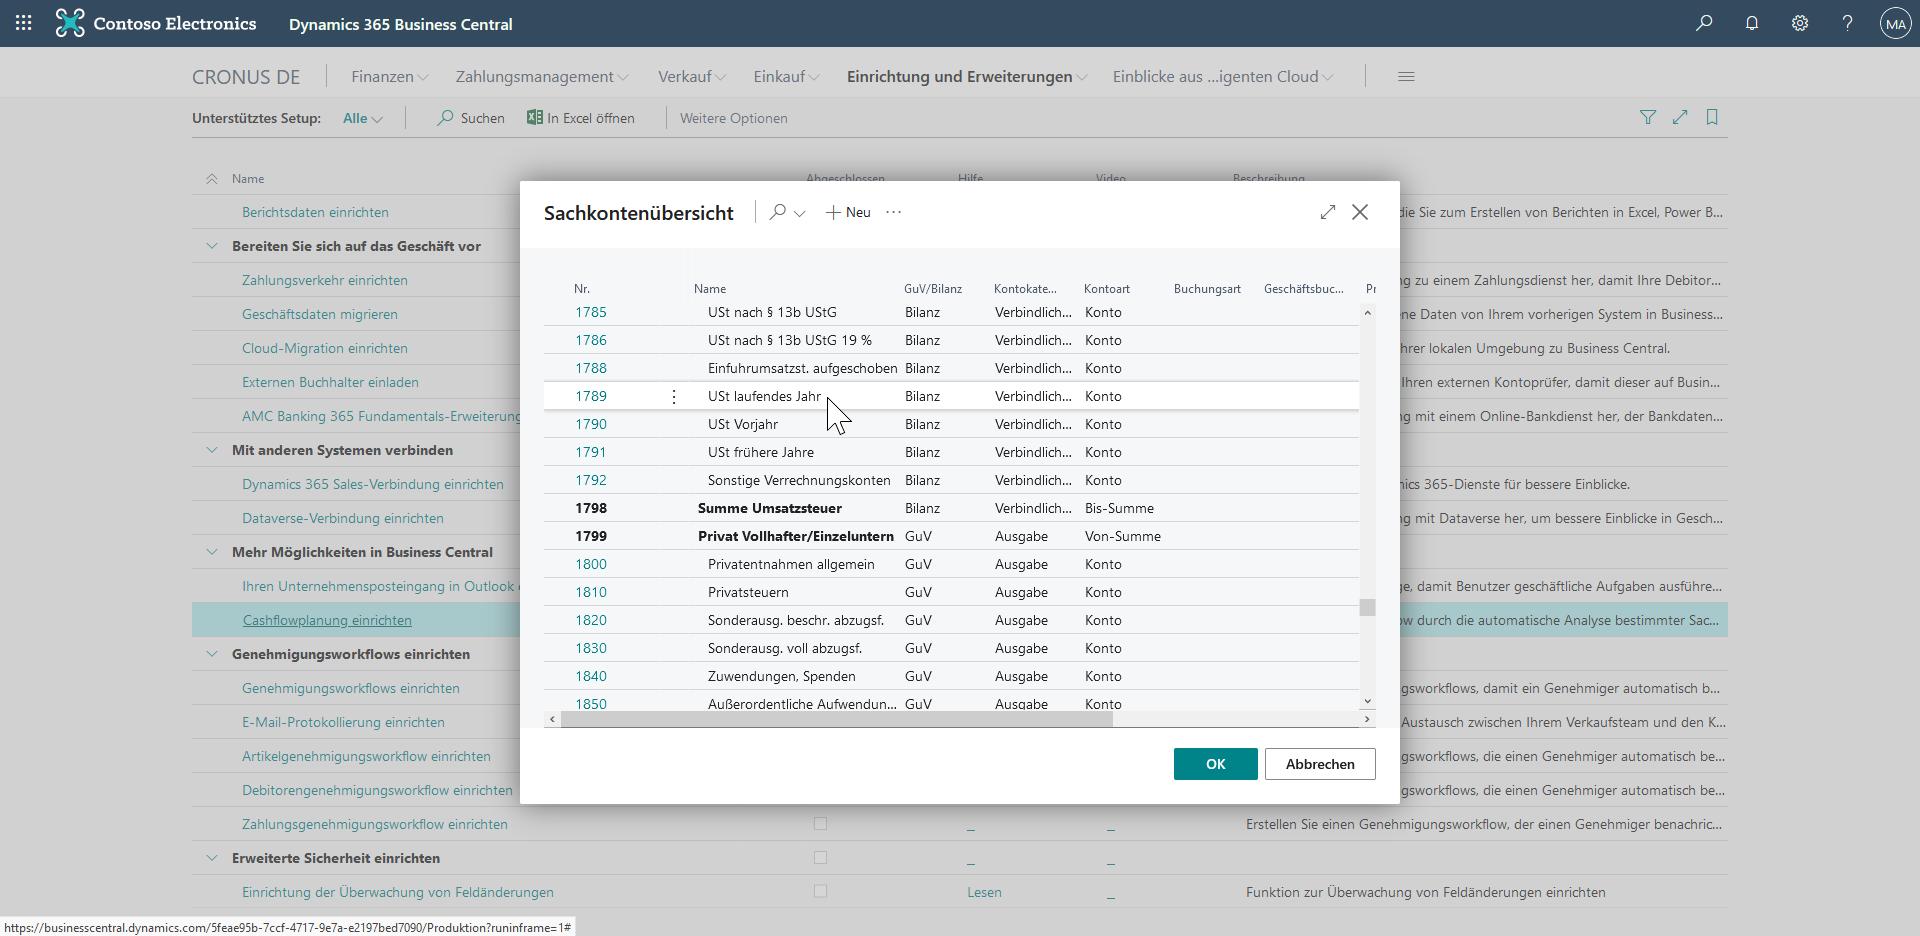 Cashflowplanung in Dynamics 365 Business Central - Unterstütztes Setup - Kontoauswahl